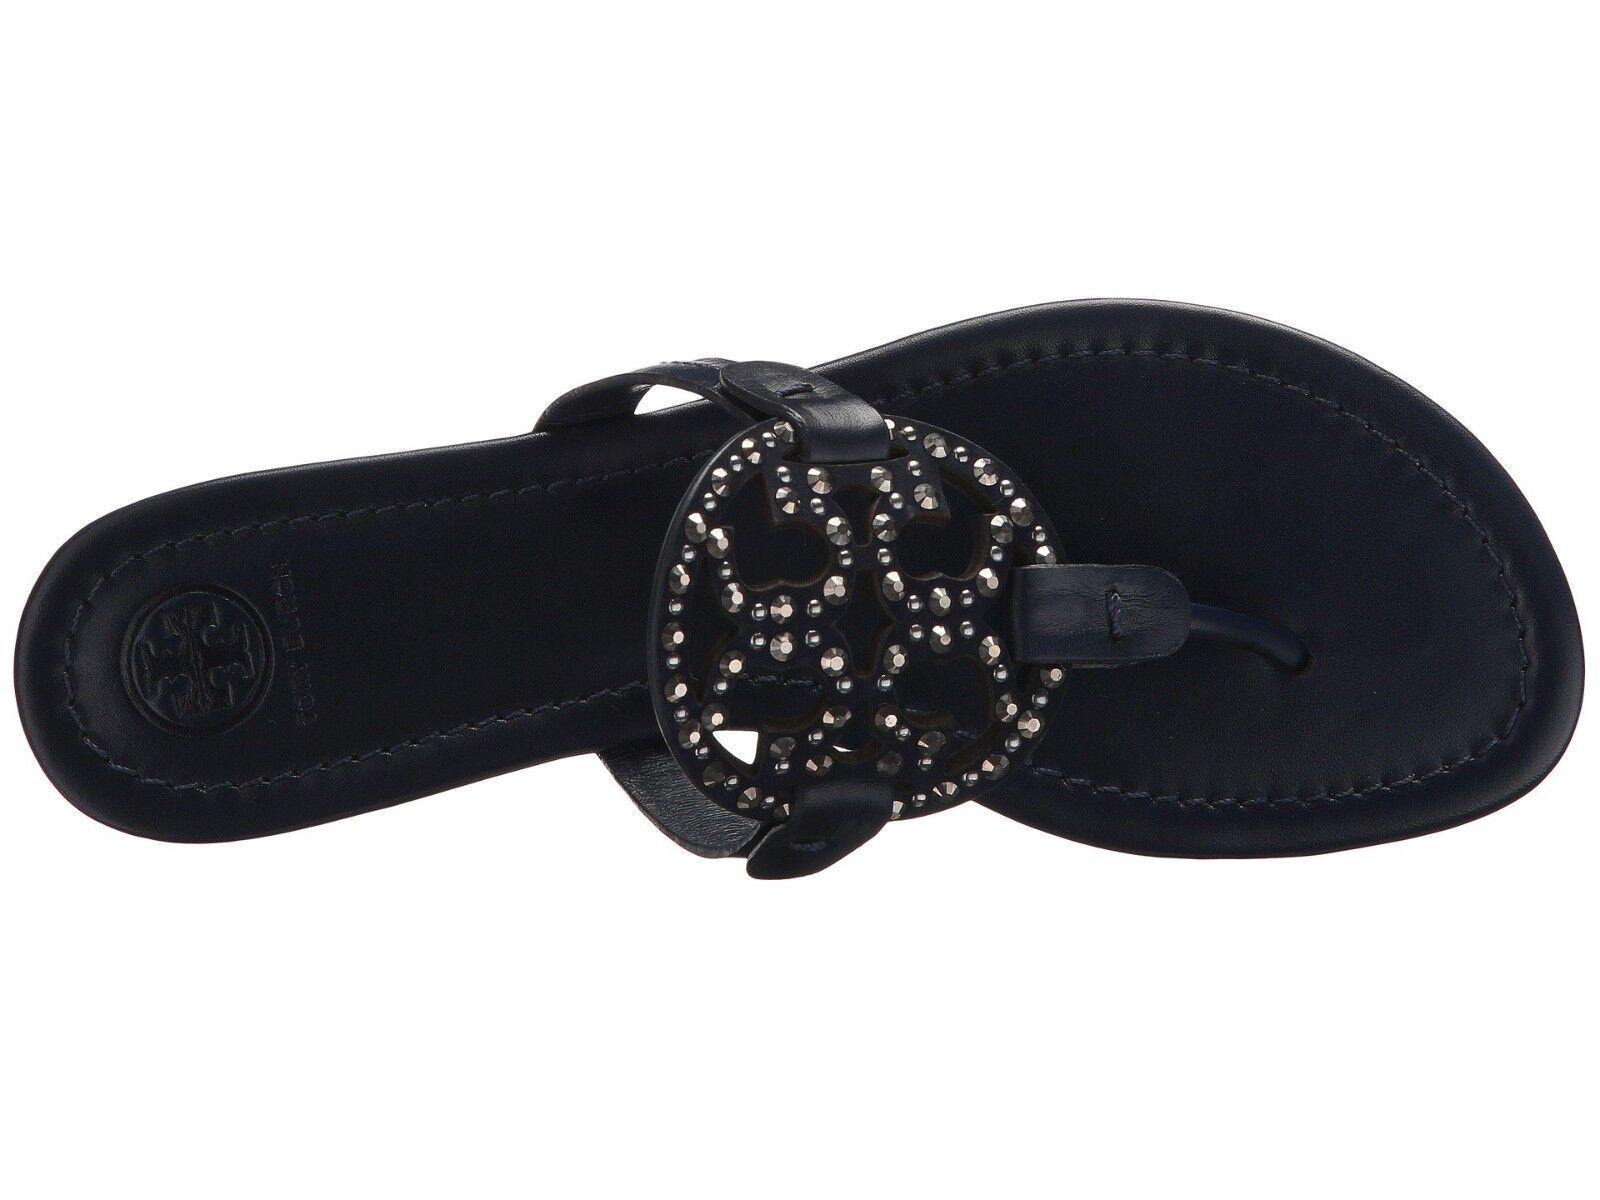 NIB Tory Burch Miller Embellished Sandals Shoes ROYAL NAVY 12 M